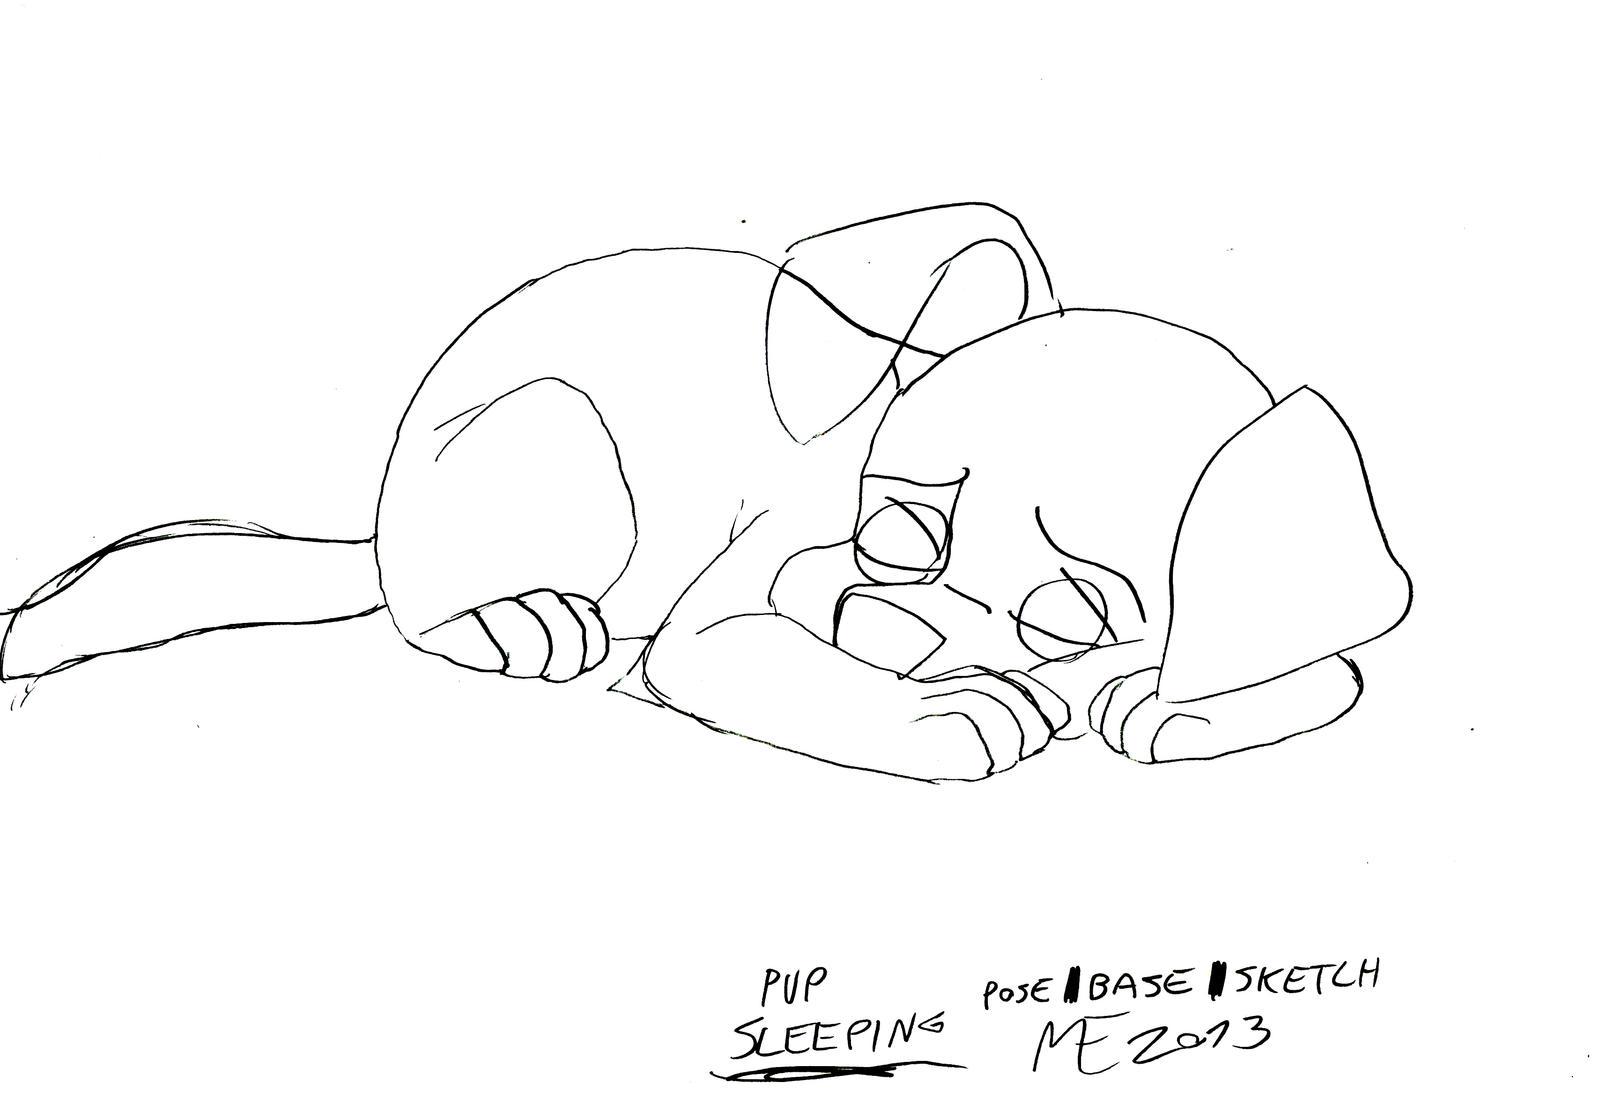 Wolfdog Pup Sleeping Base Sleeping Dog Drawing